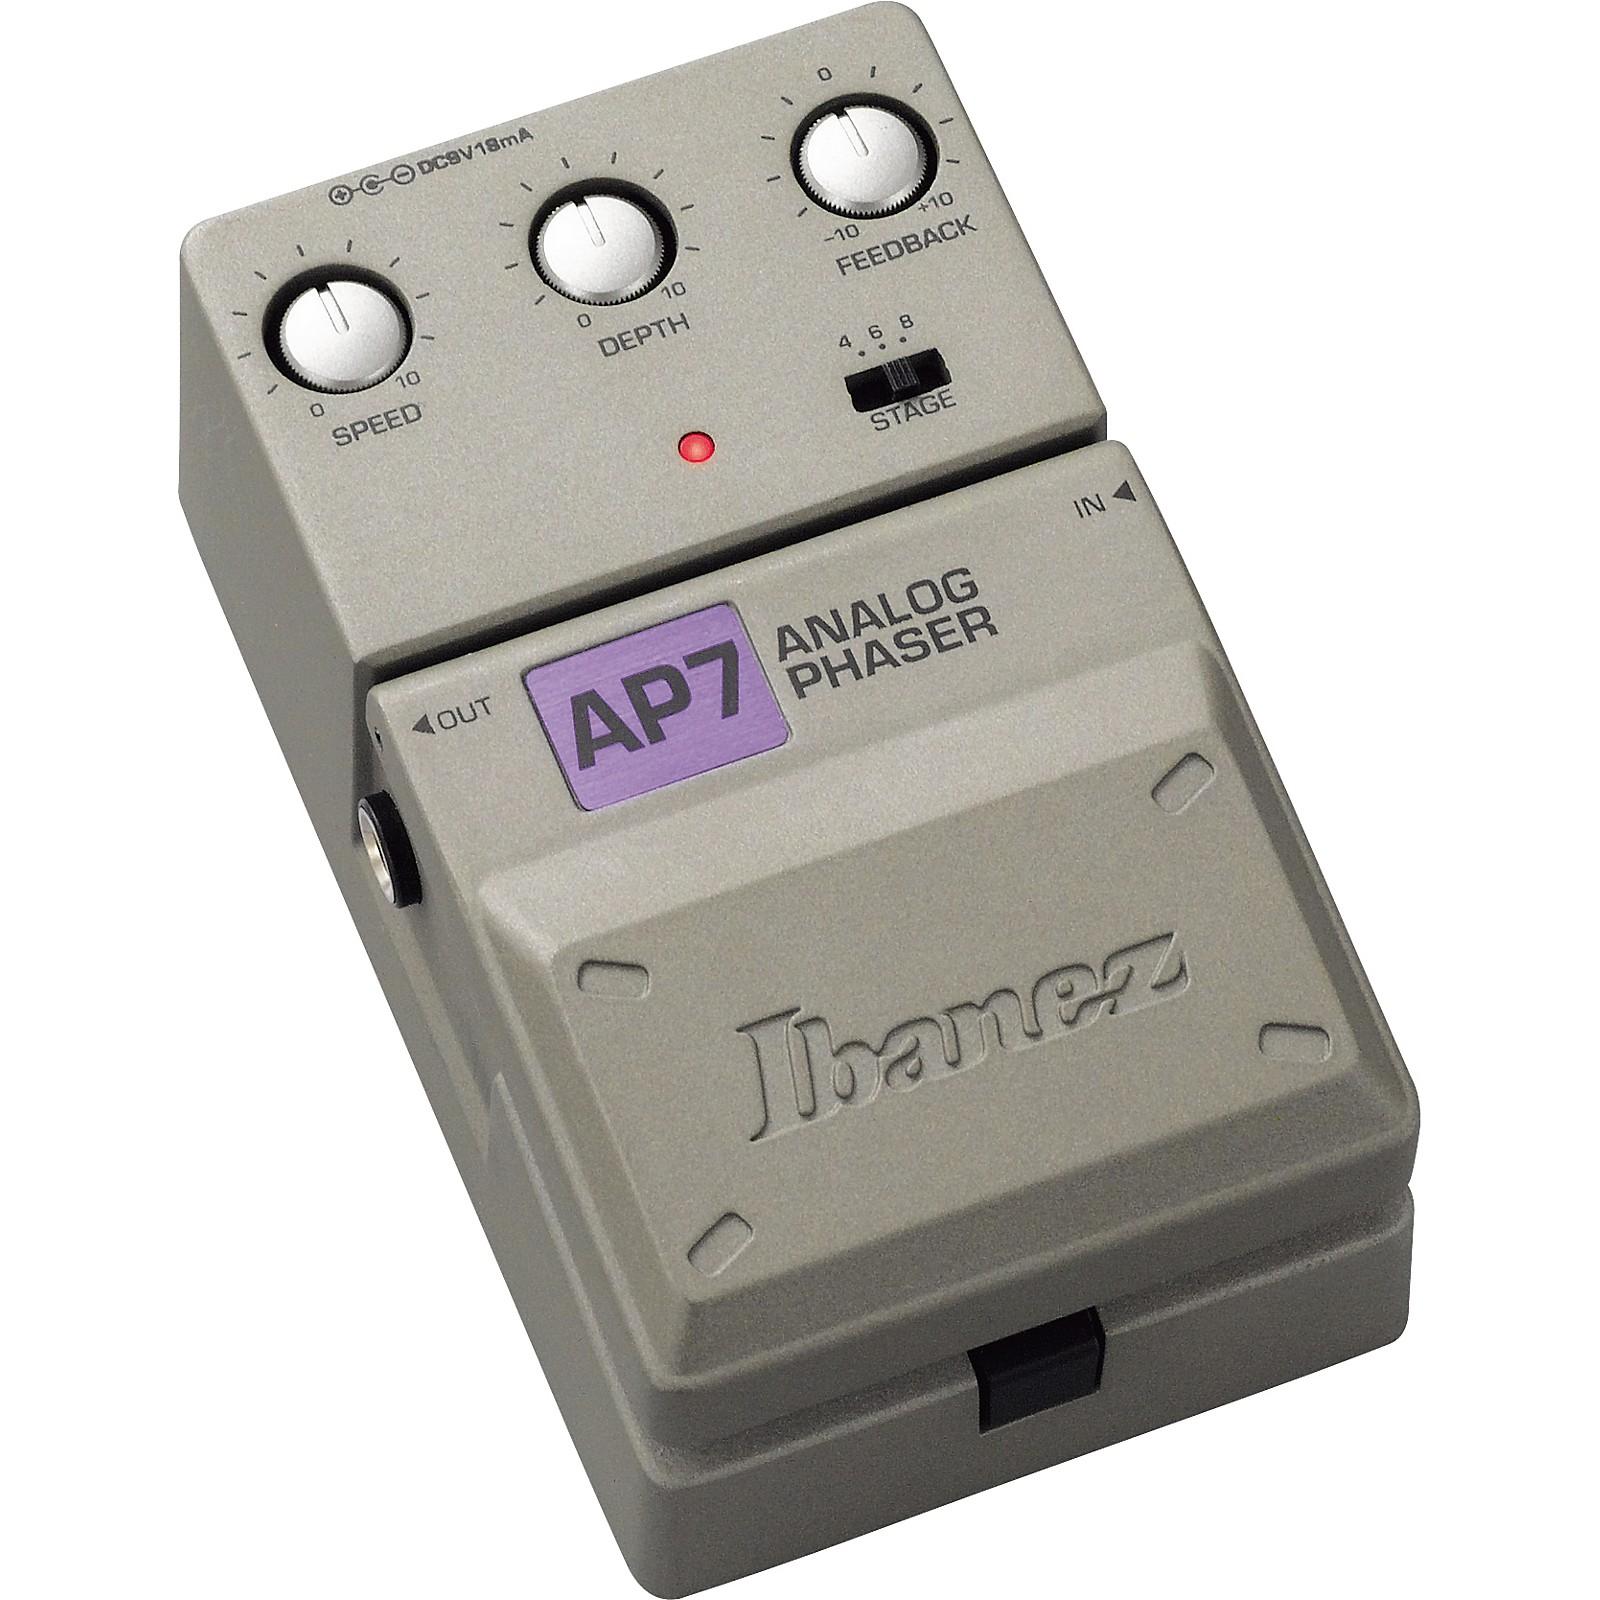 Ibanez Tone-Lok AP7 Analog Phaser Guitar Effects Pedal